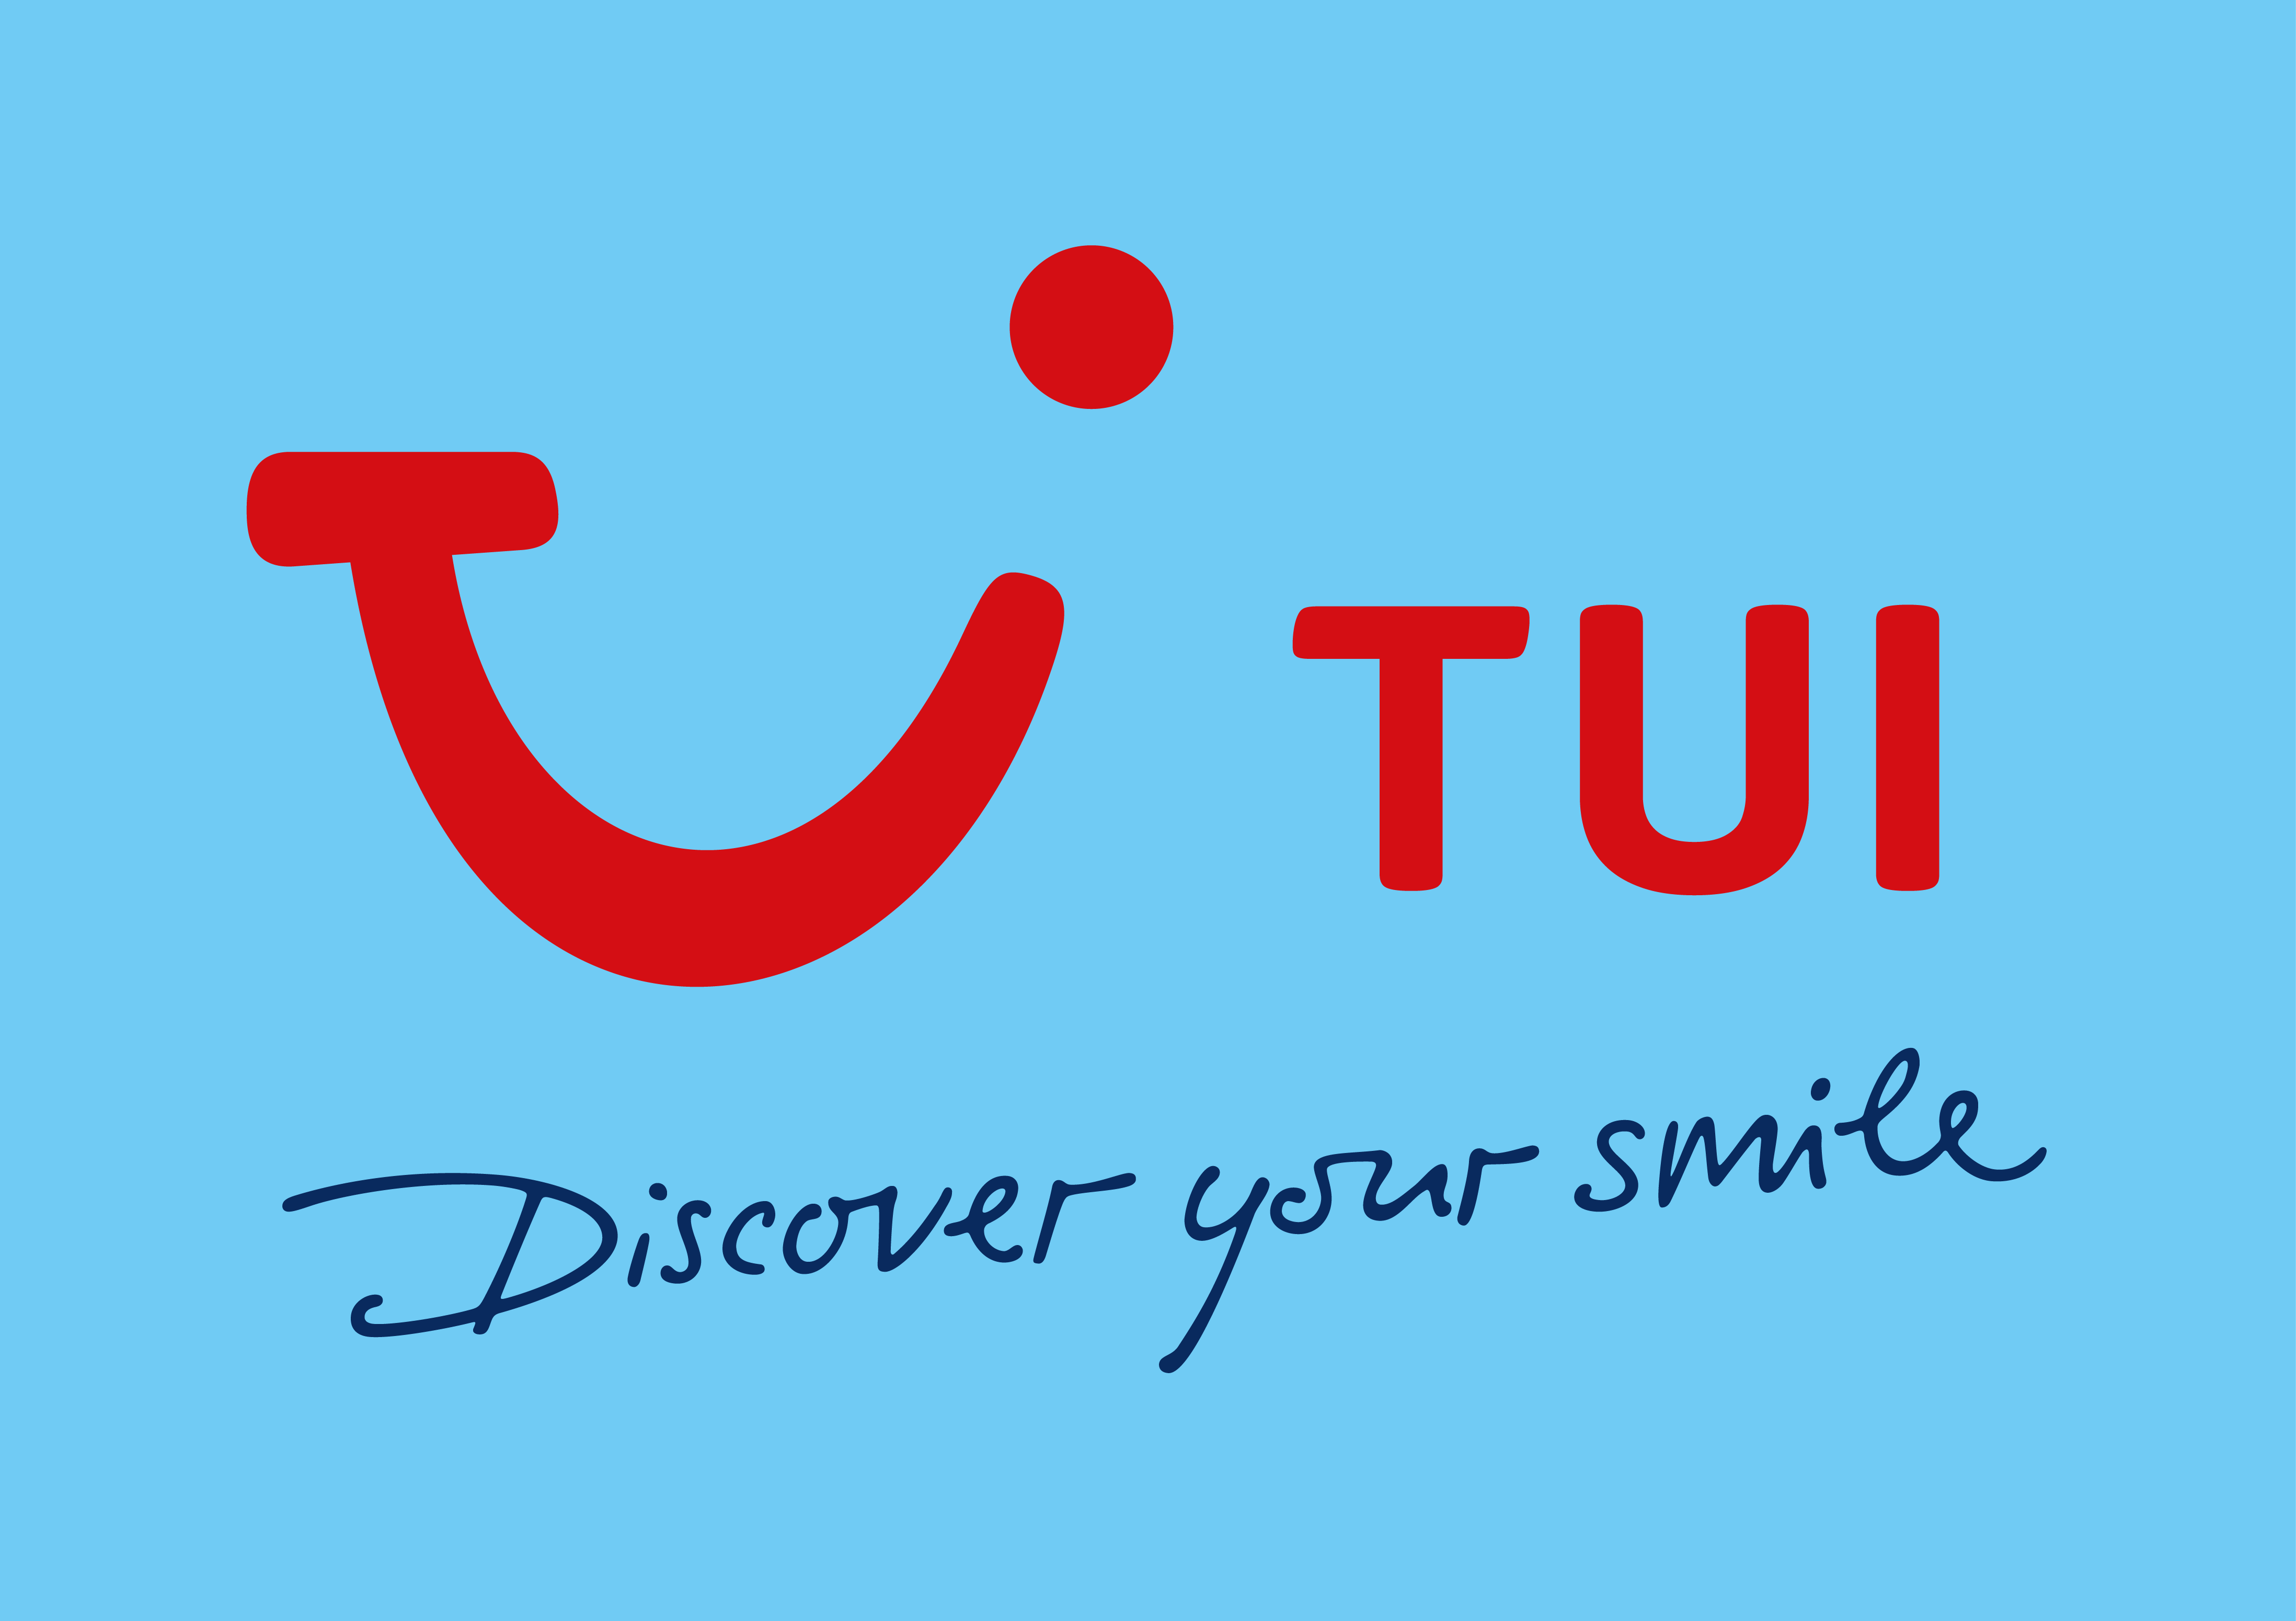 TUI Holiday Store Poulton-Le-Fylde 01253 896465